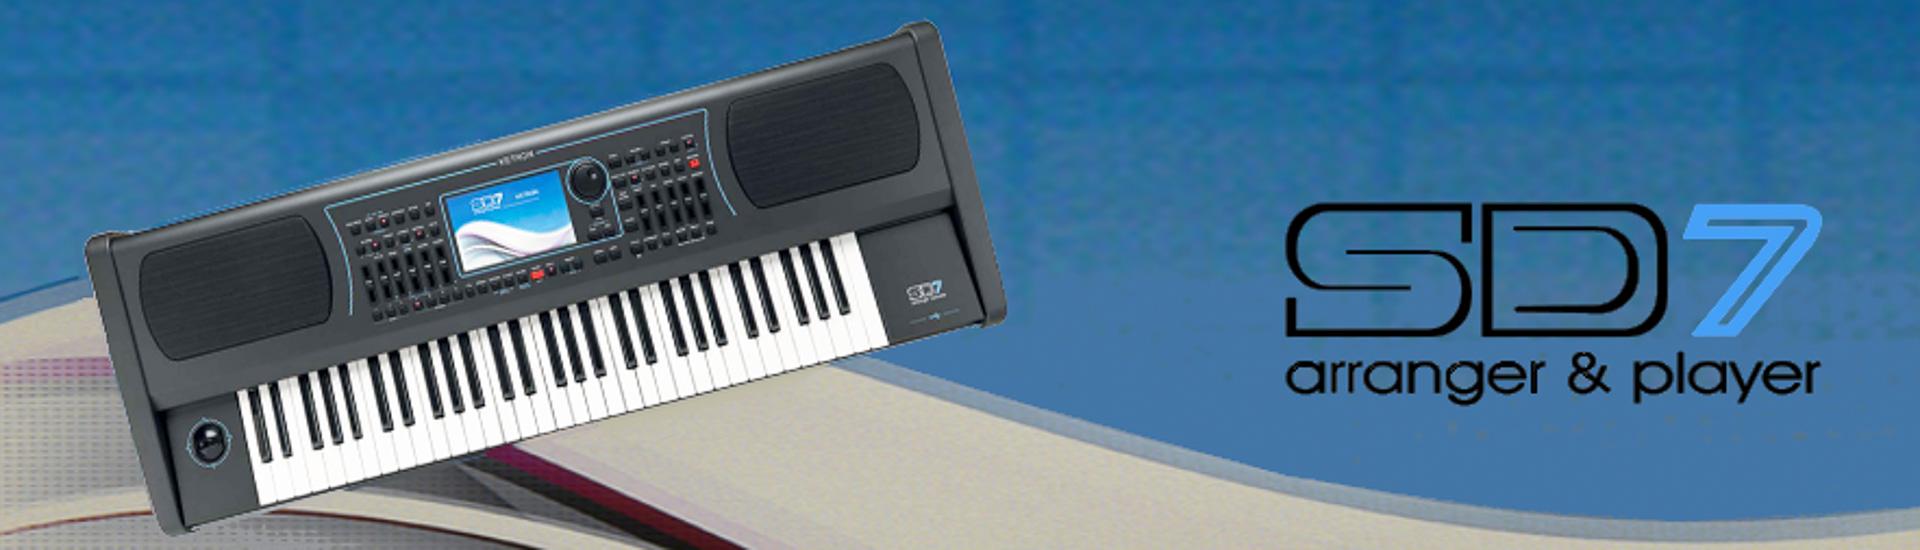 Ketron teclados profissionais SD7